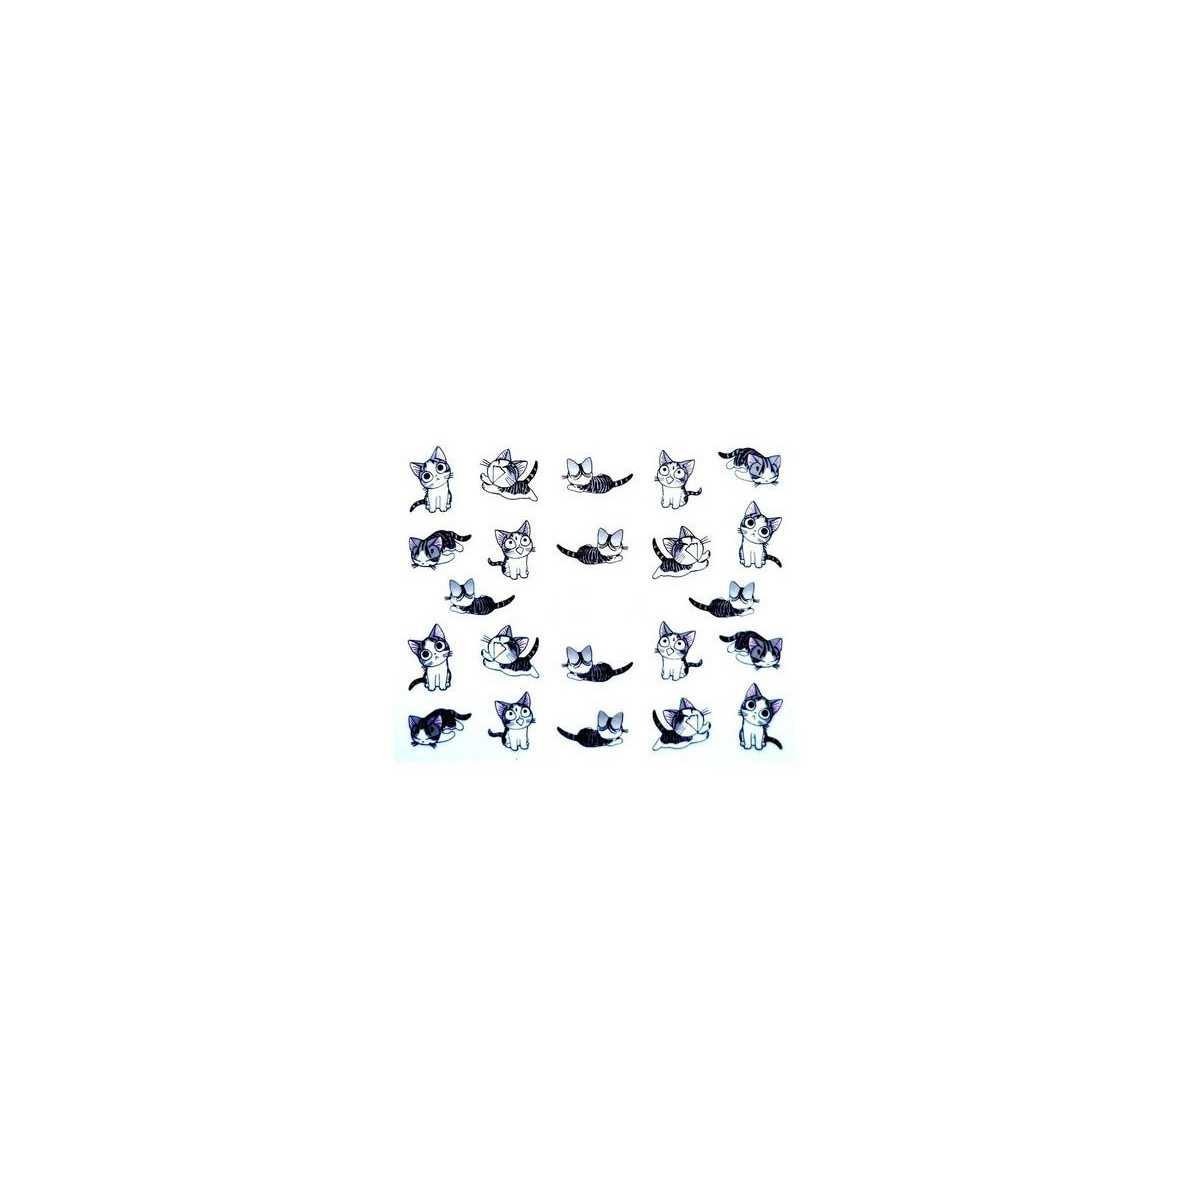 https://www.kit-manucure.com/379-thickbox_default/water-decasl-chats-noir-et-blanc.jpg